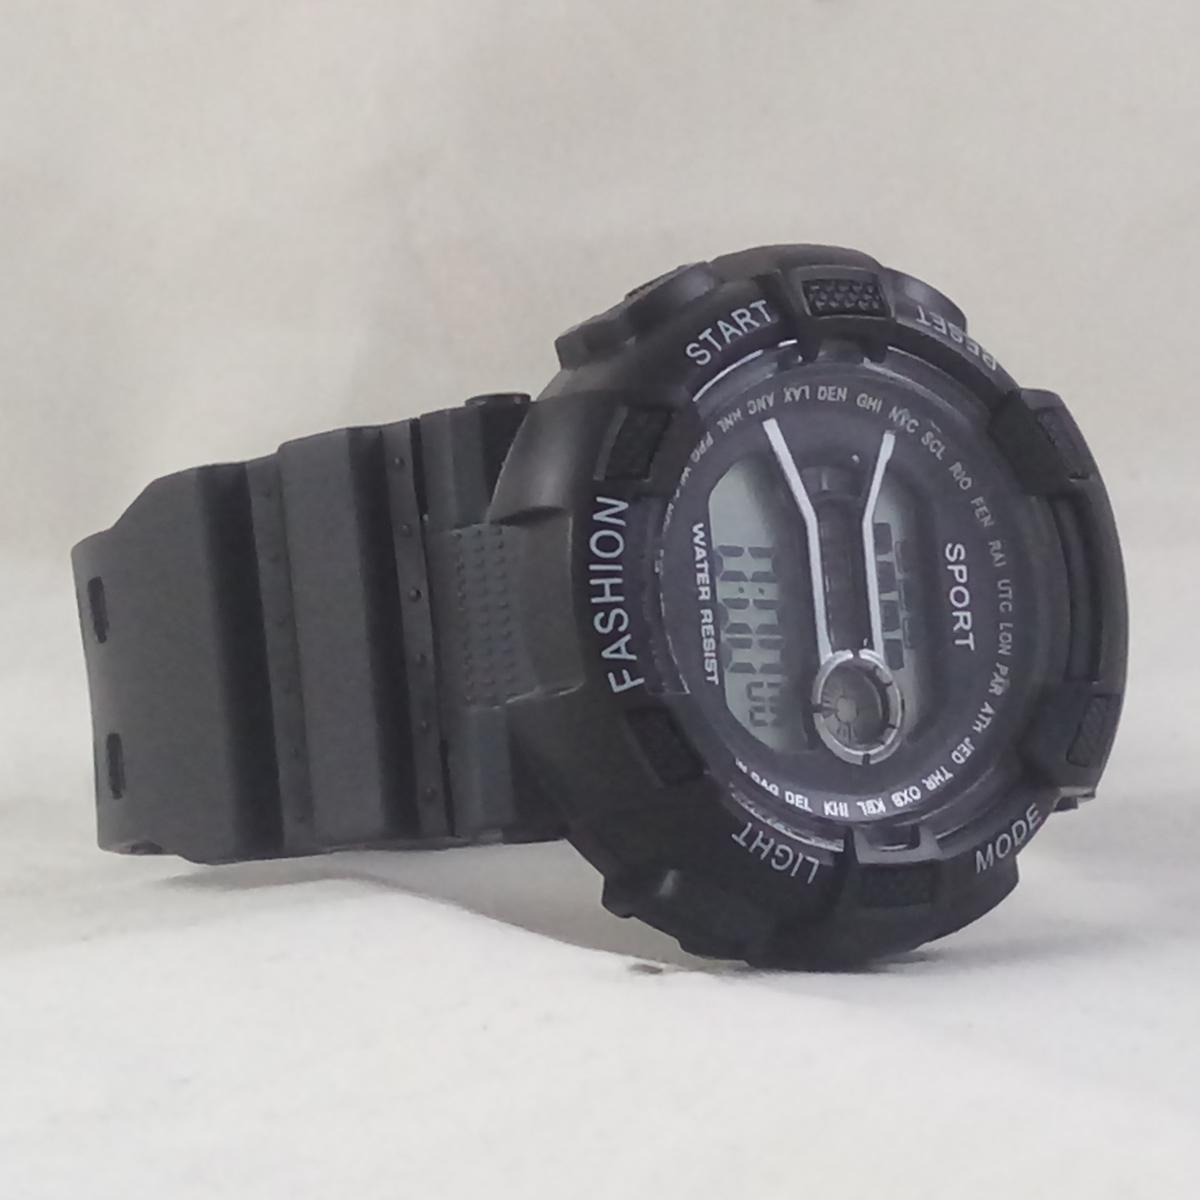 ساعت مچی دیجیتال مردانه مدل Od-Wt00005              اصل